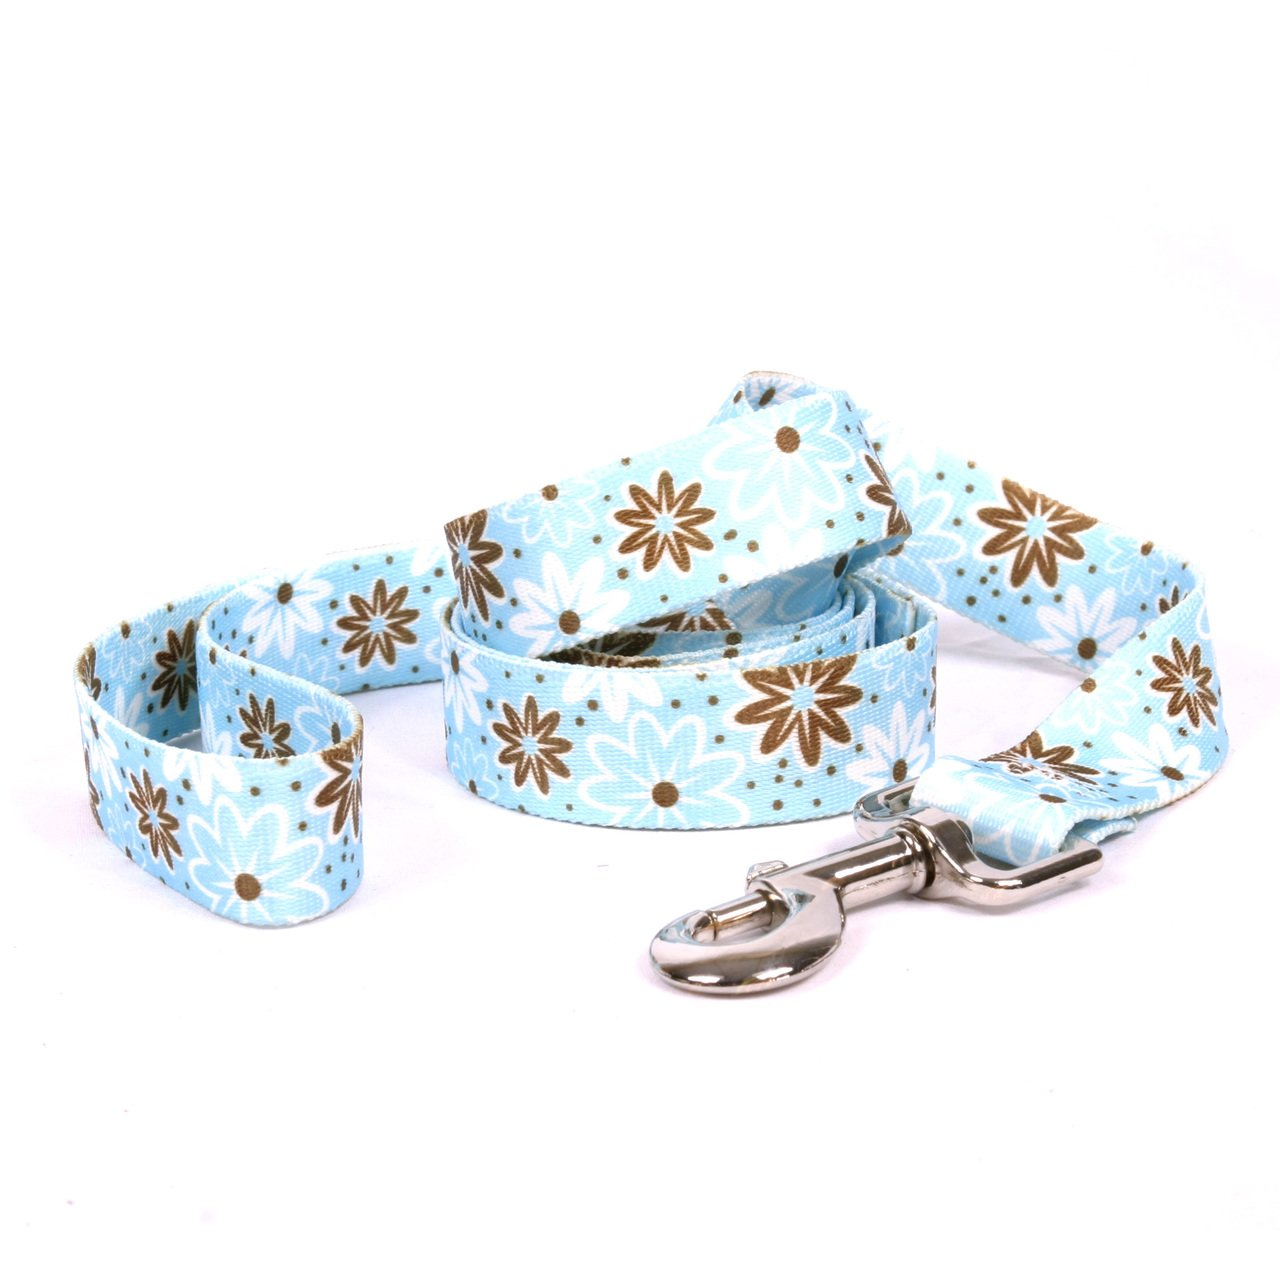 Yellow Dog Design Daisy Chain Blue Dog Leash 3/4'' Wide And 5' (60'') Long, Small/Medium